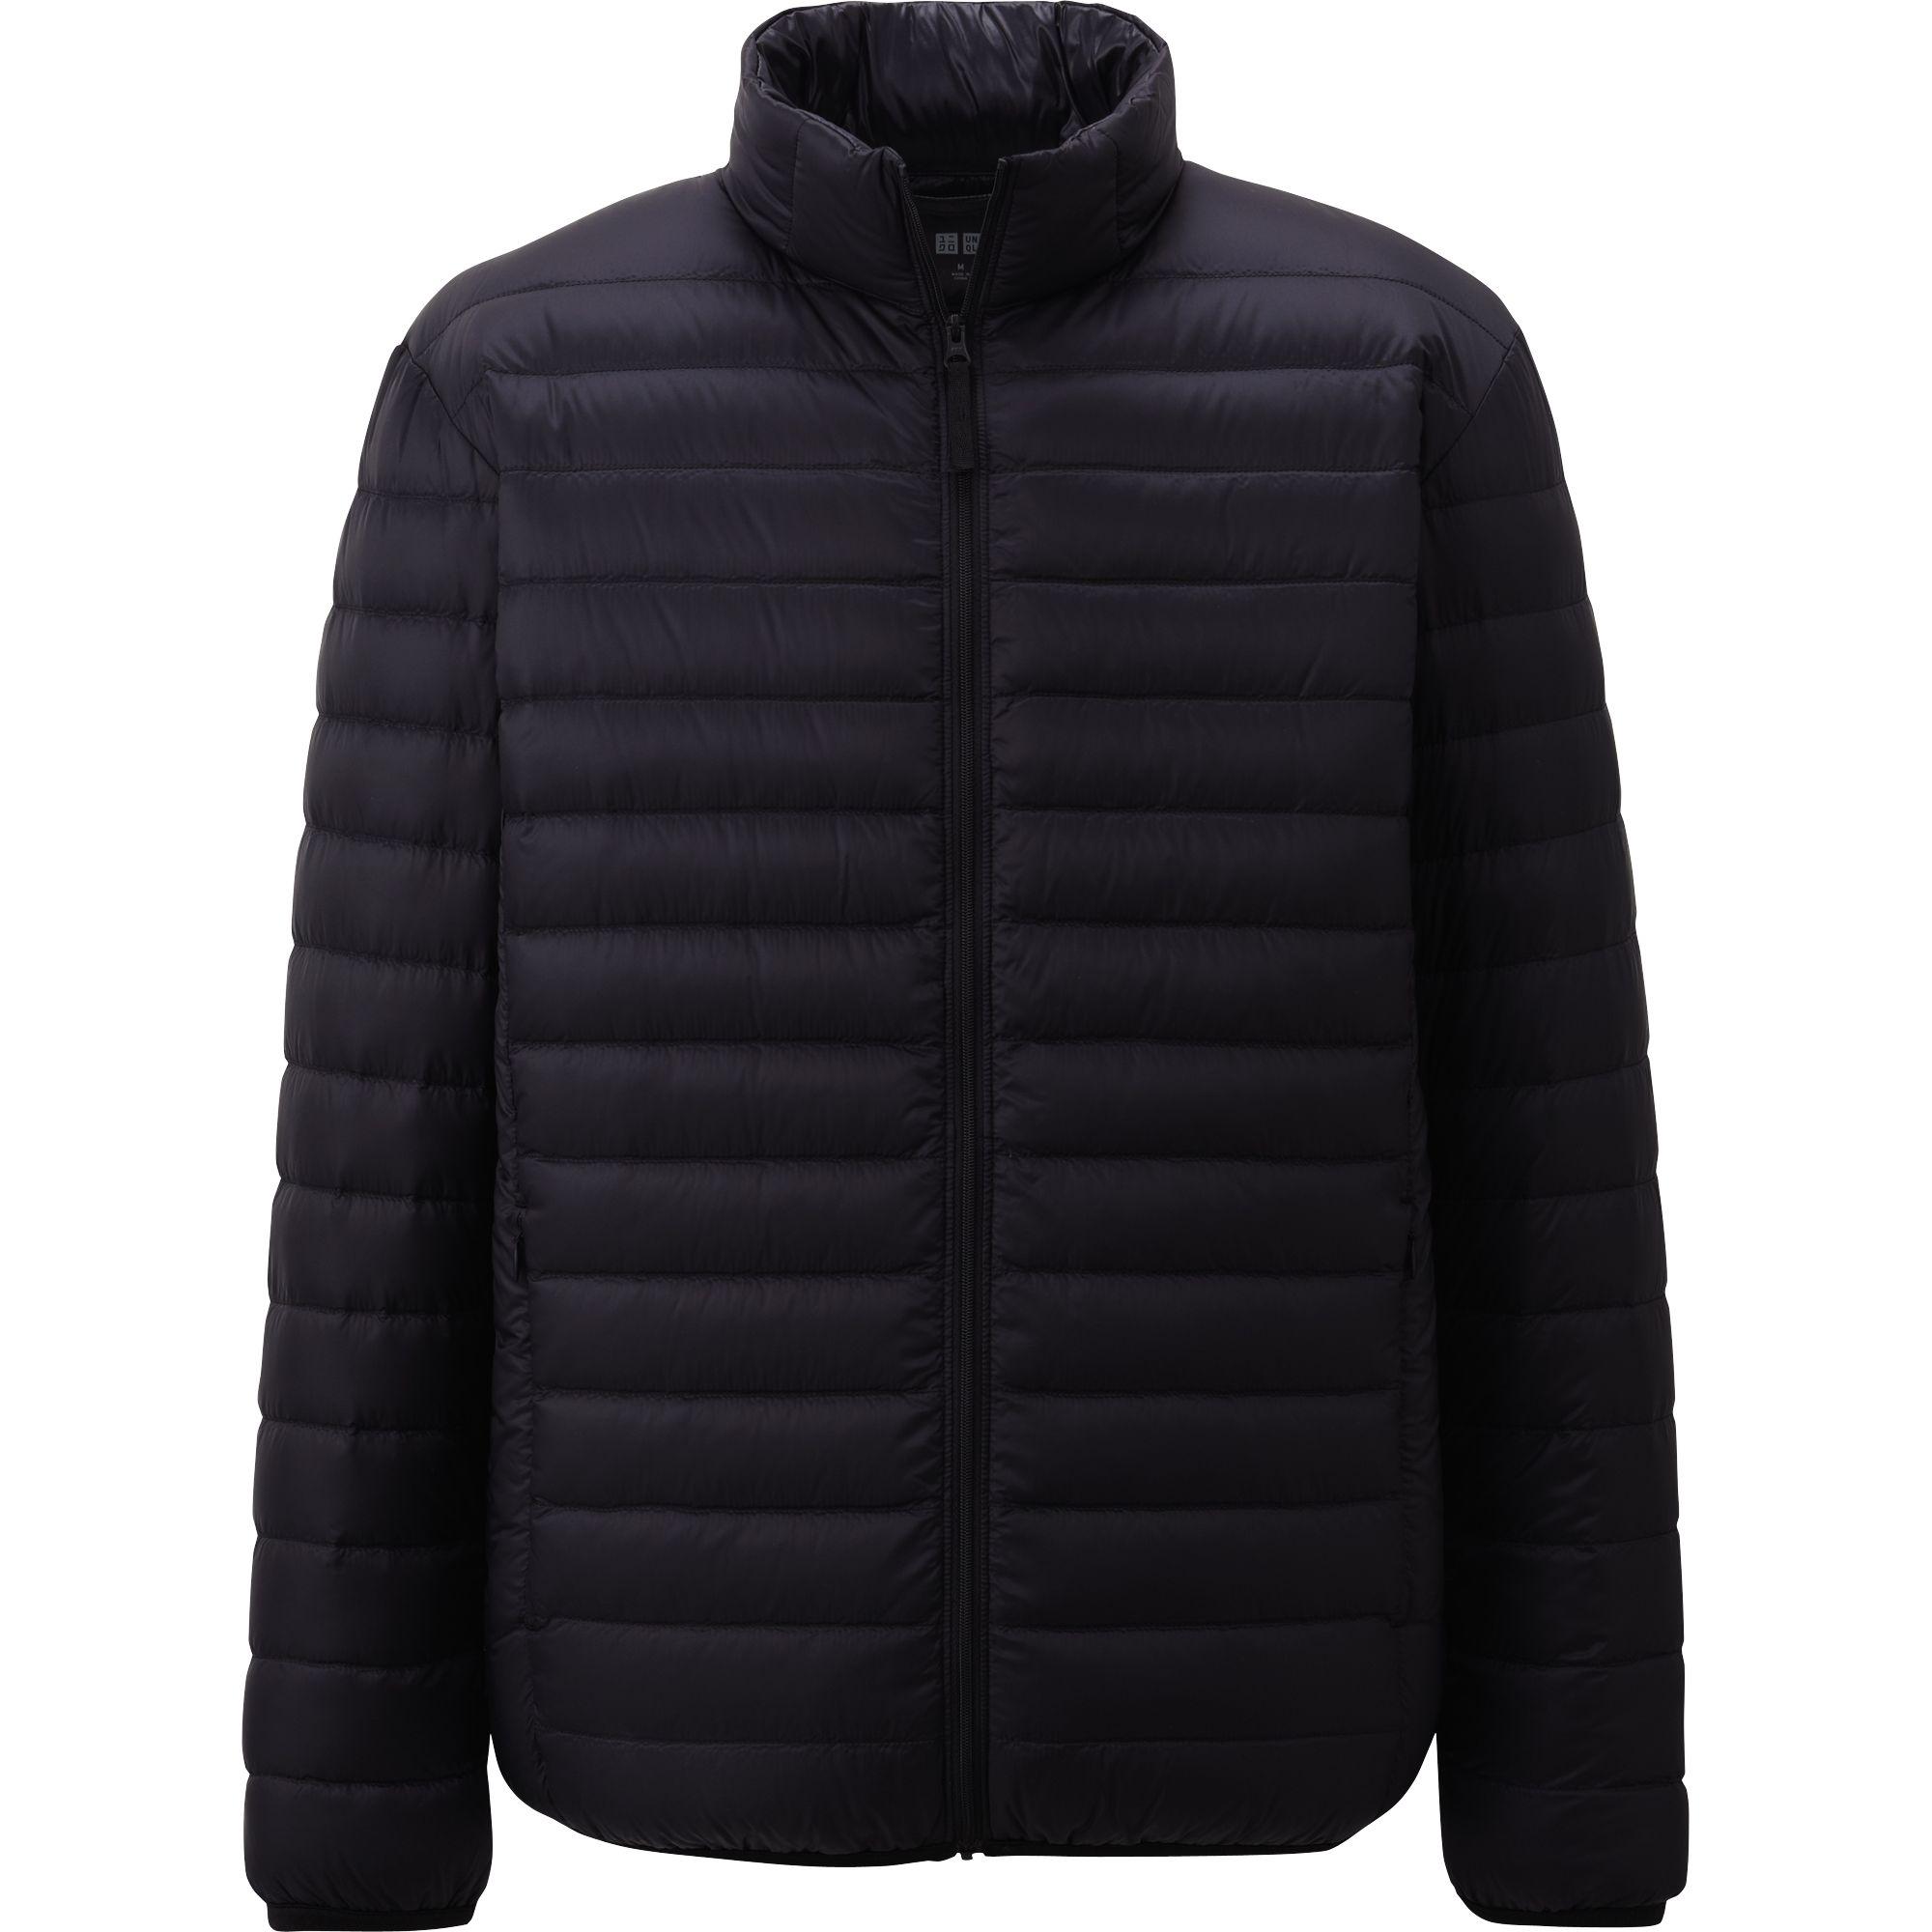 Uniqlo Ultra Light Down Jacket In Black For Men Lyst